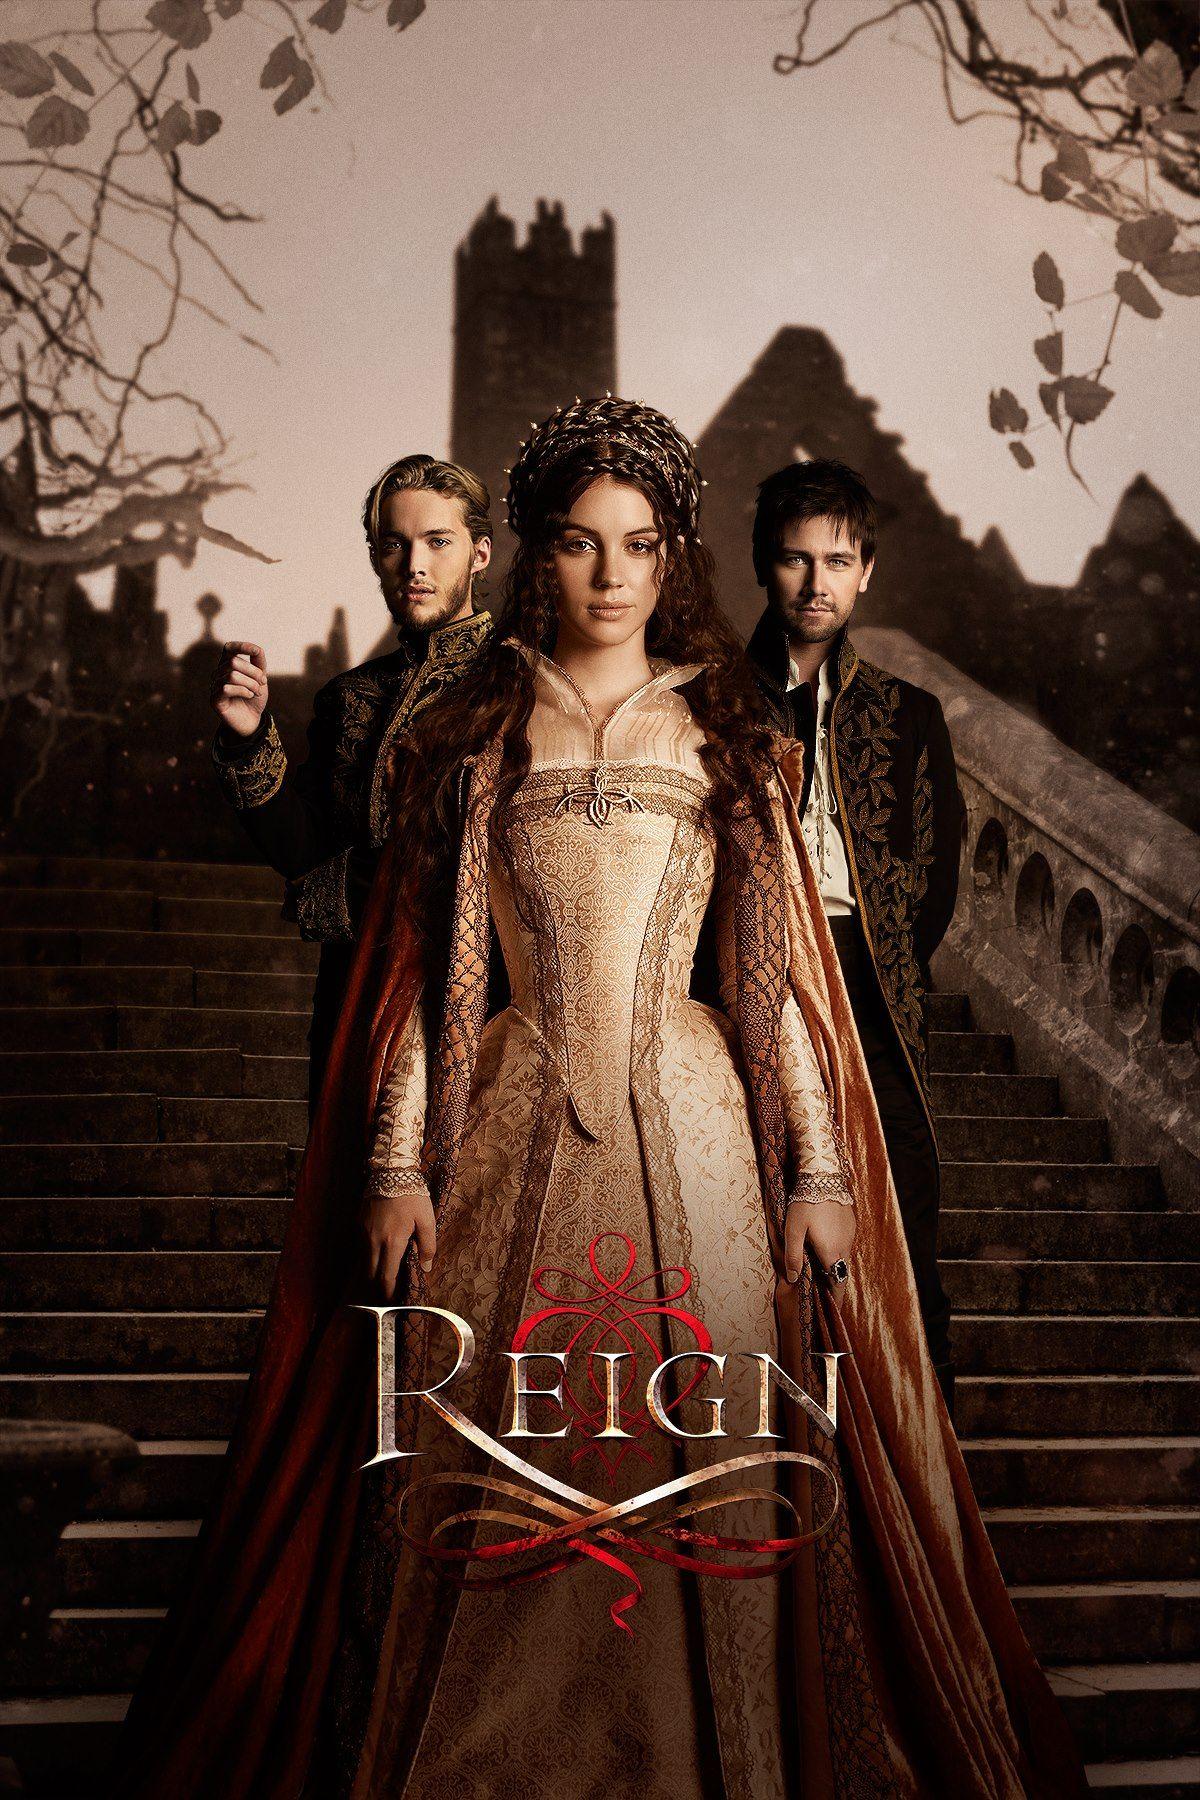 Reign - Season 1 Promo | Reign tv show, Reign fashion, Reign dresses